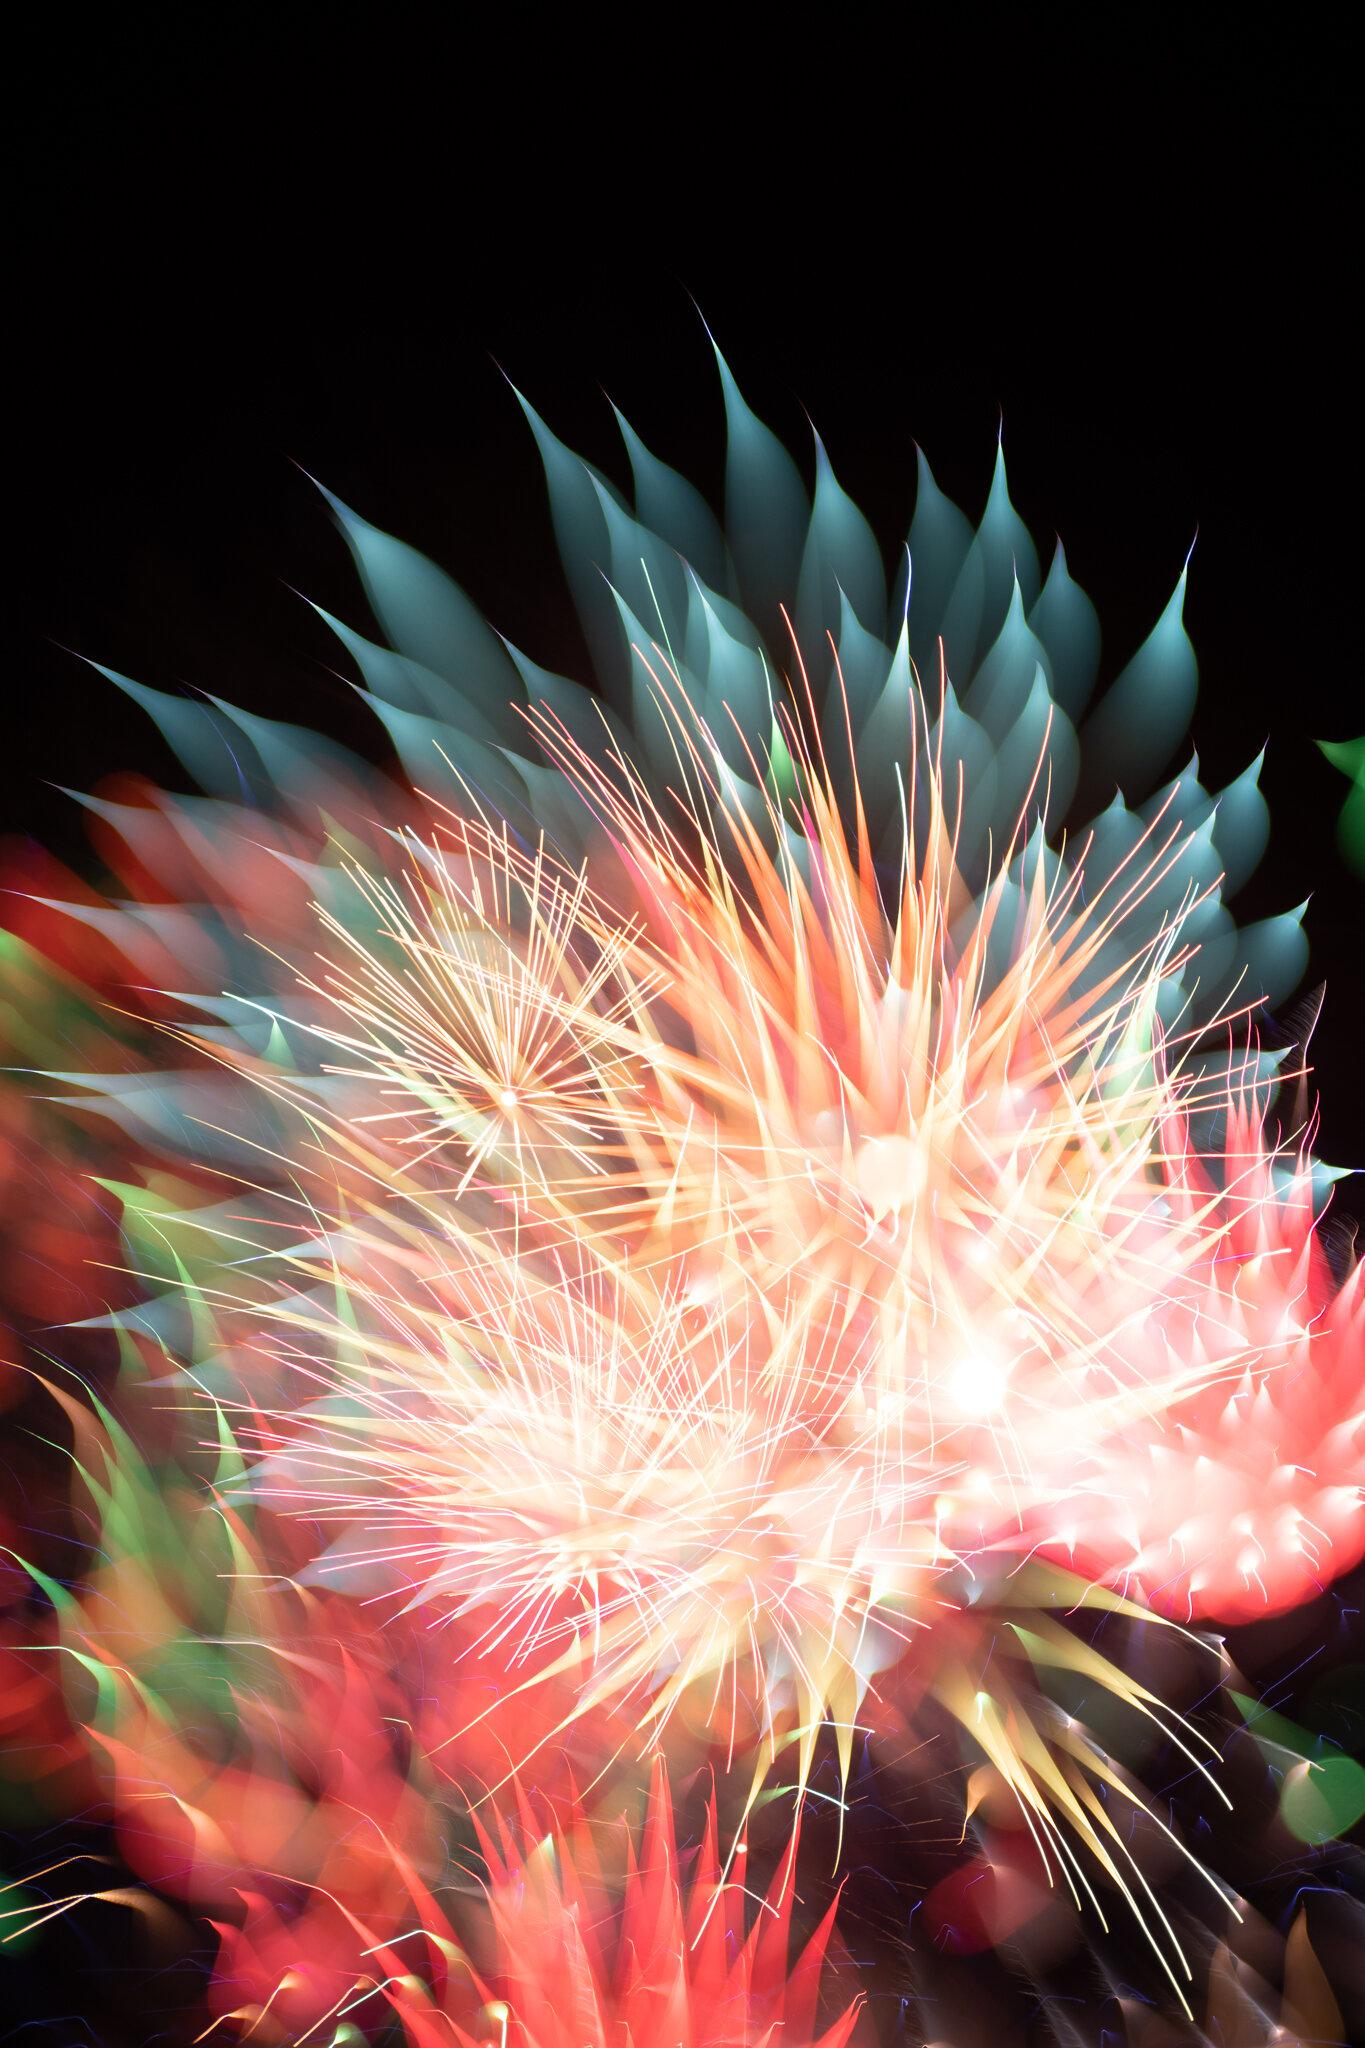 focuspulledfireworks-17.jpg